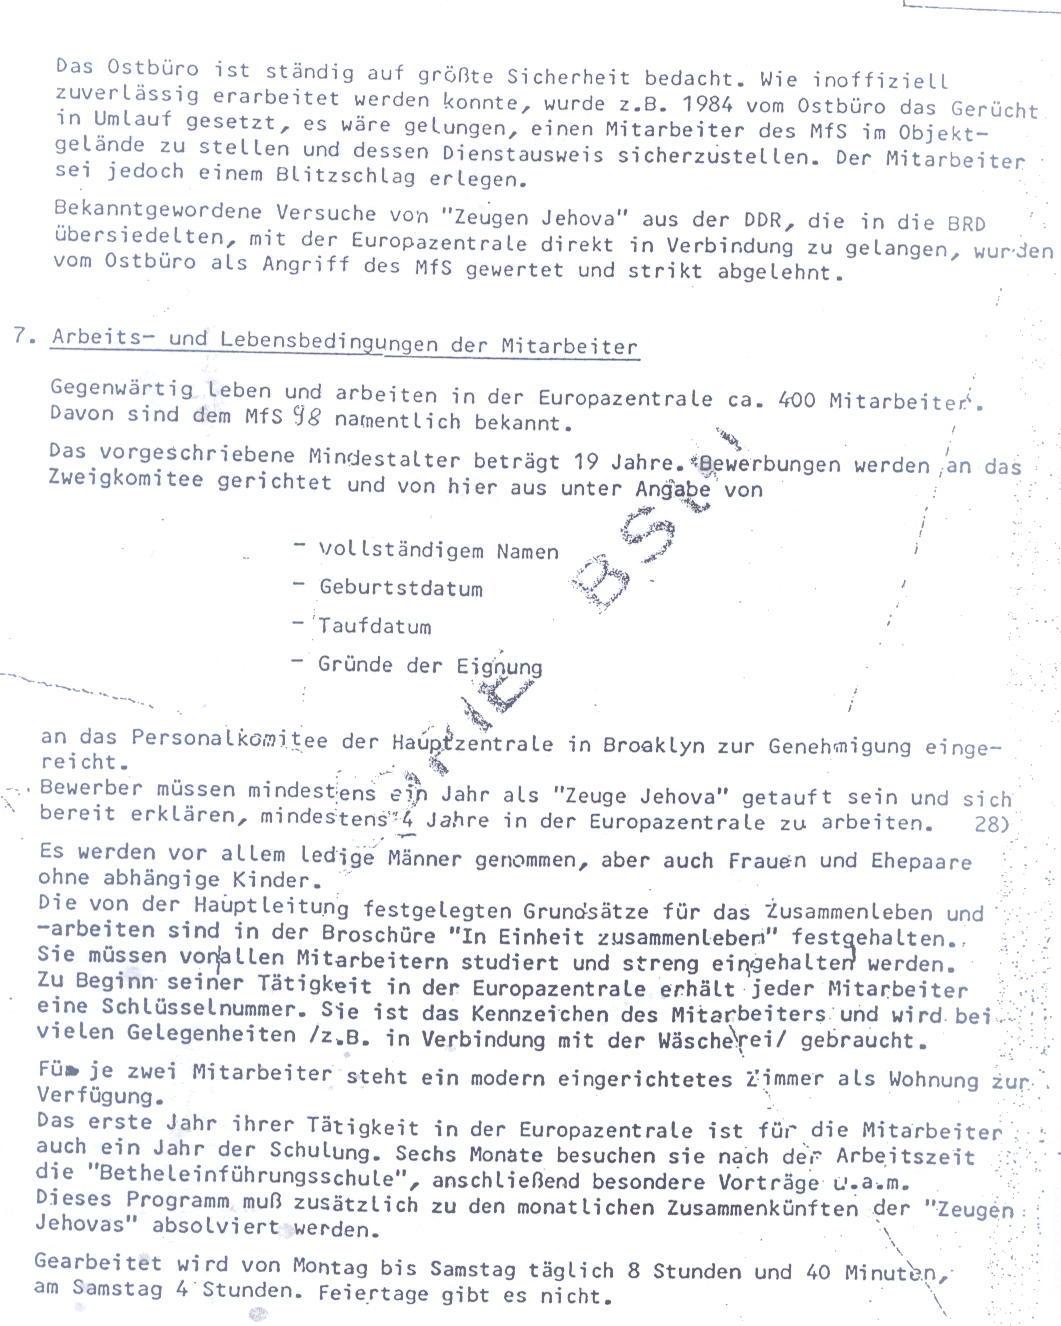 http://www.manfred-gebhard.de/Sachstand115.jpg